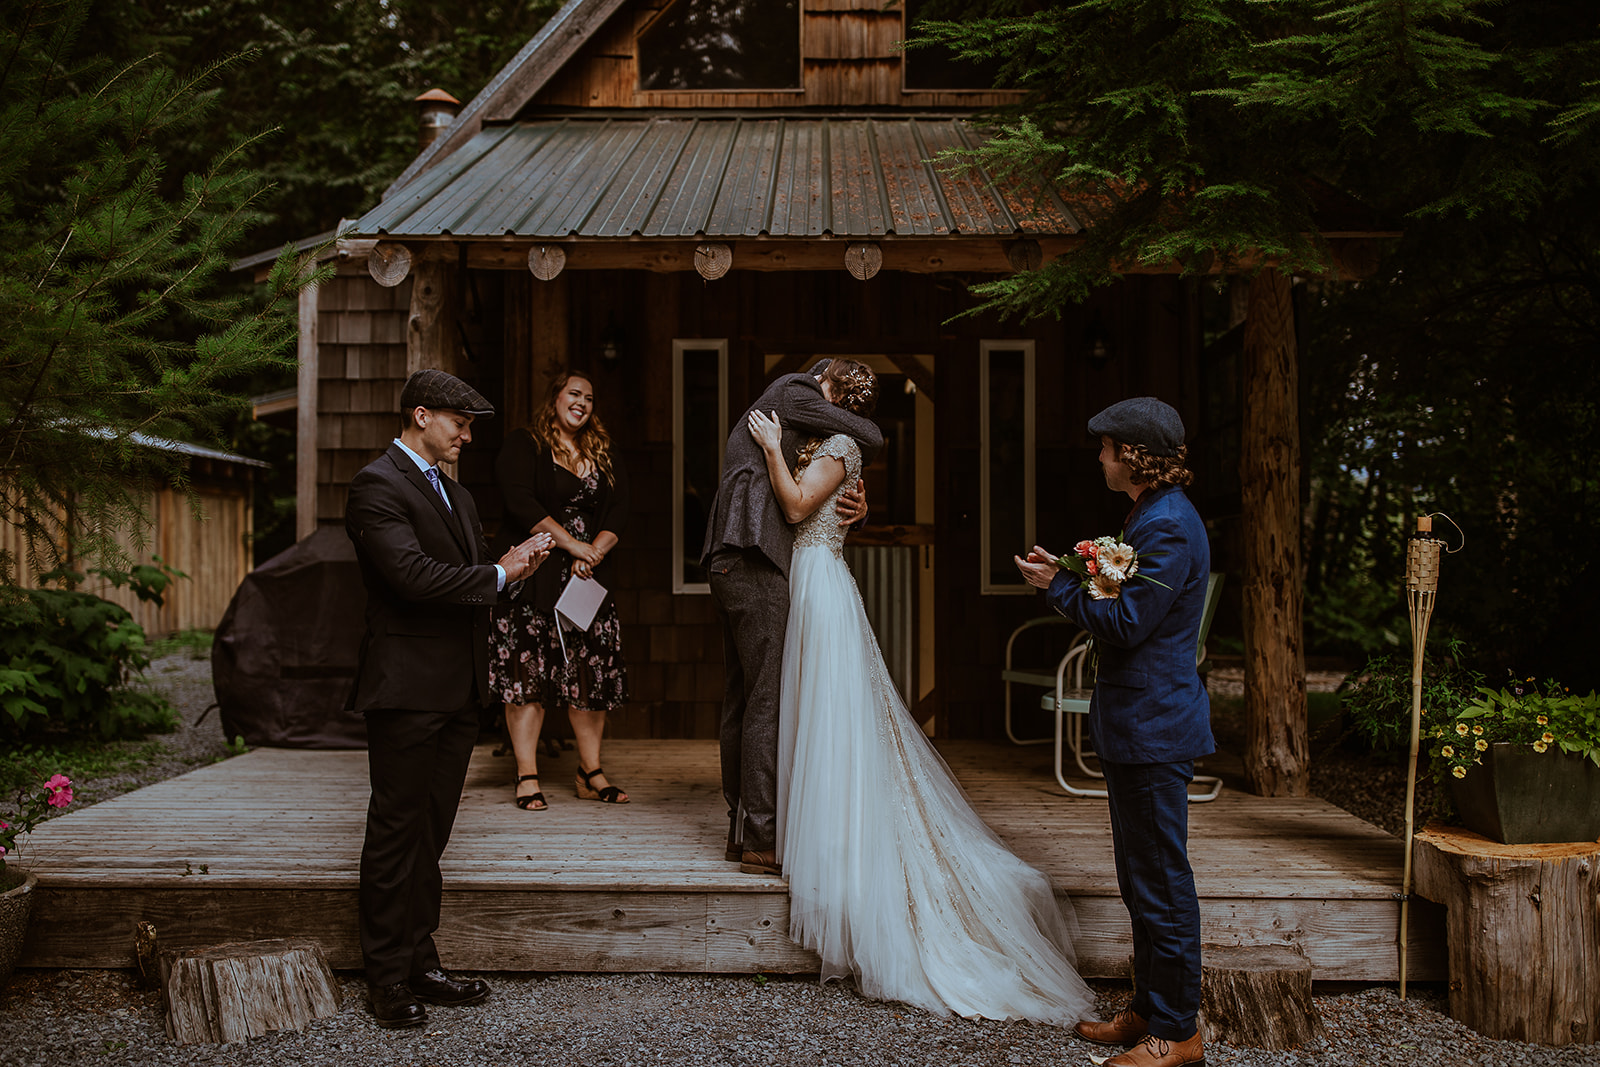 mount-rainier-cabin-elopement-megan-gallagher-photography_(245_of_568).jpg